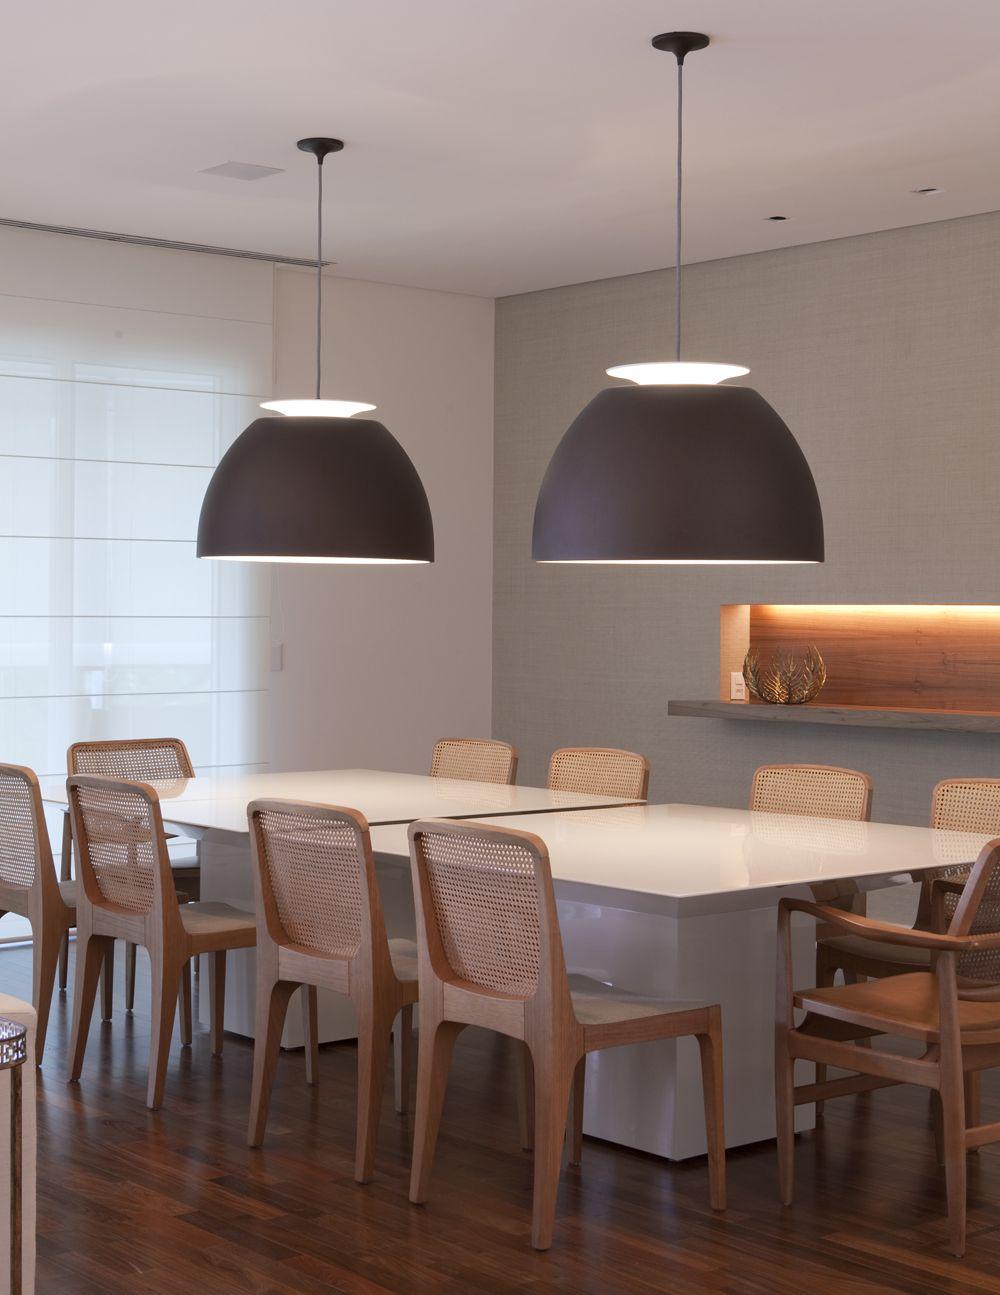 Luminaria Pendente Sala Jantar u2013 Lorrels com